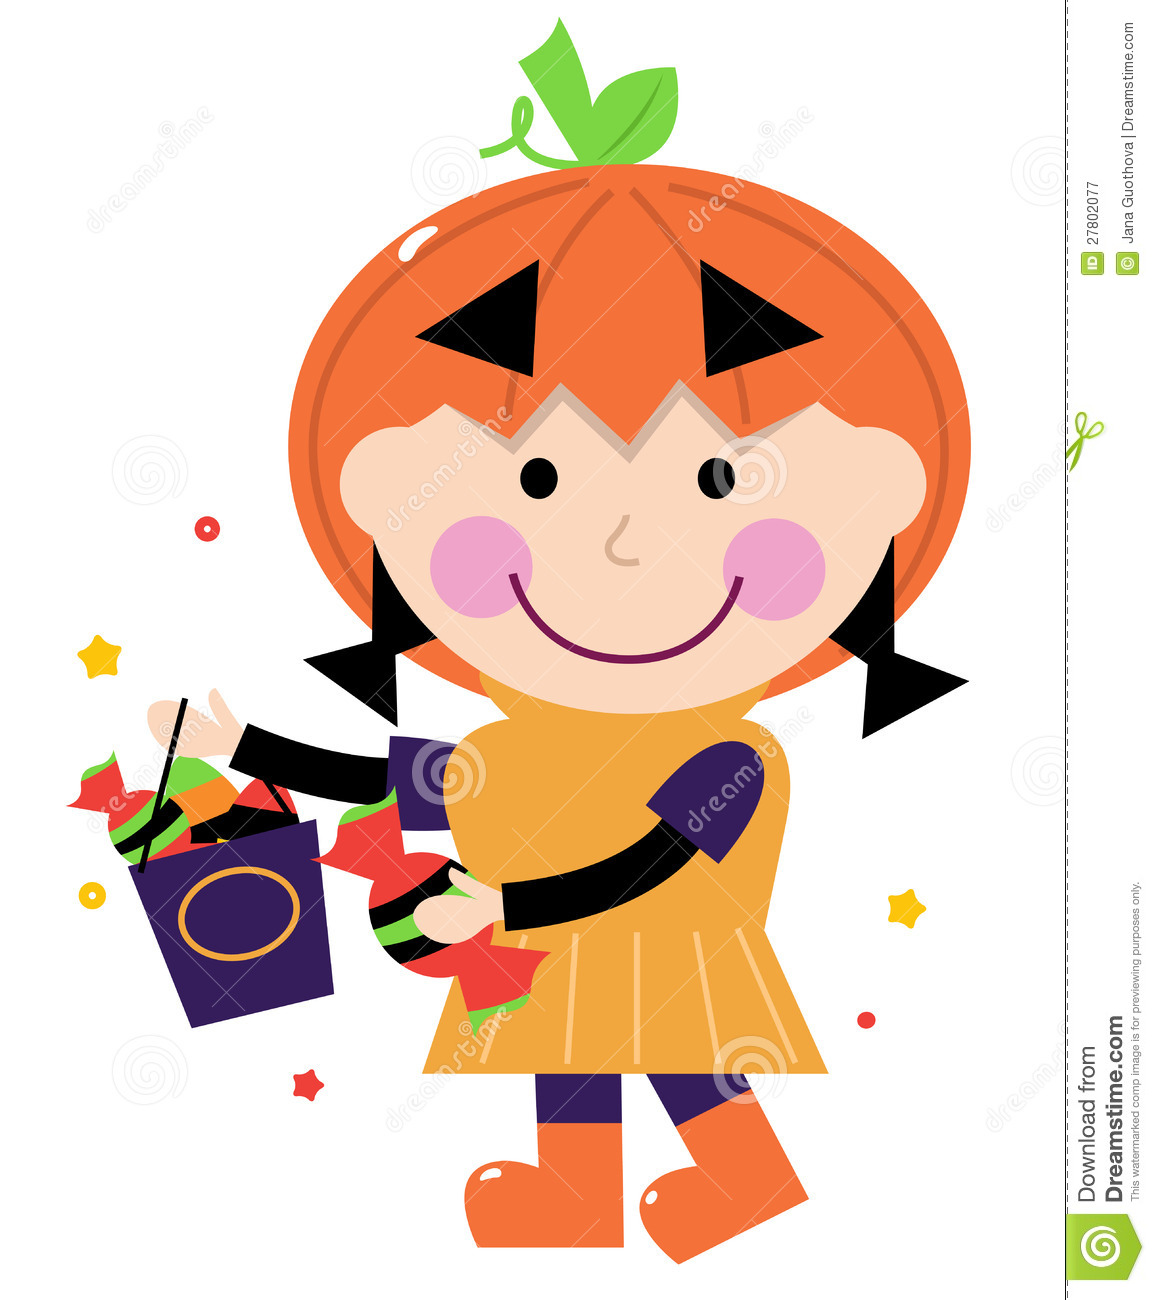 Cute kids with pumpkins clipart.